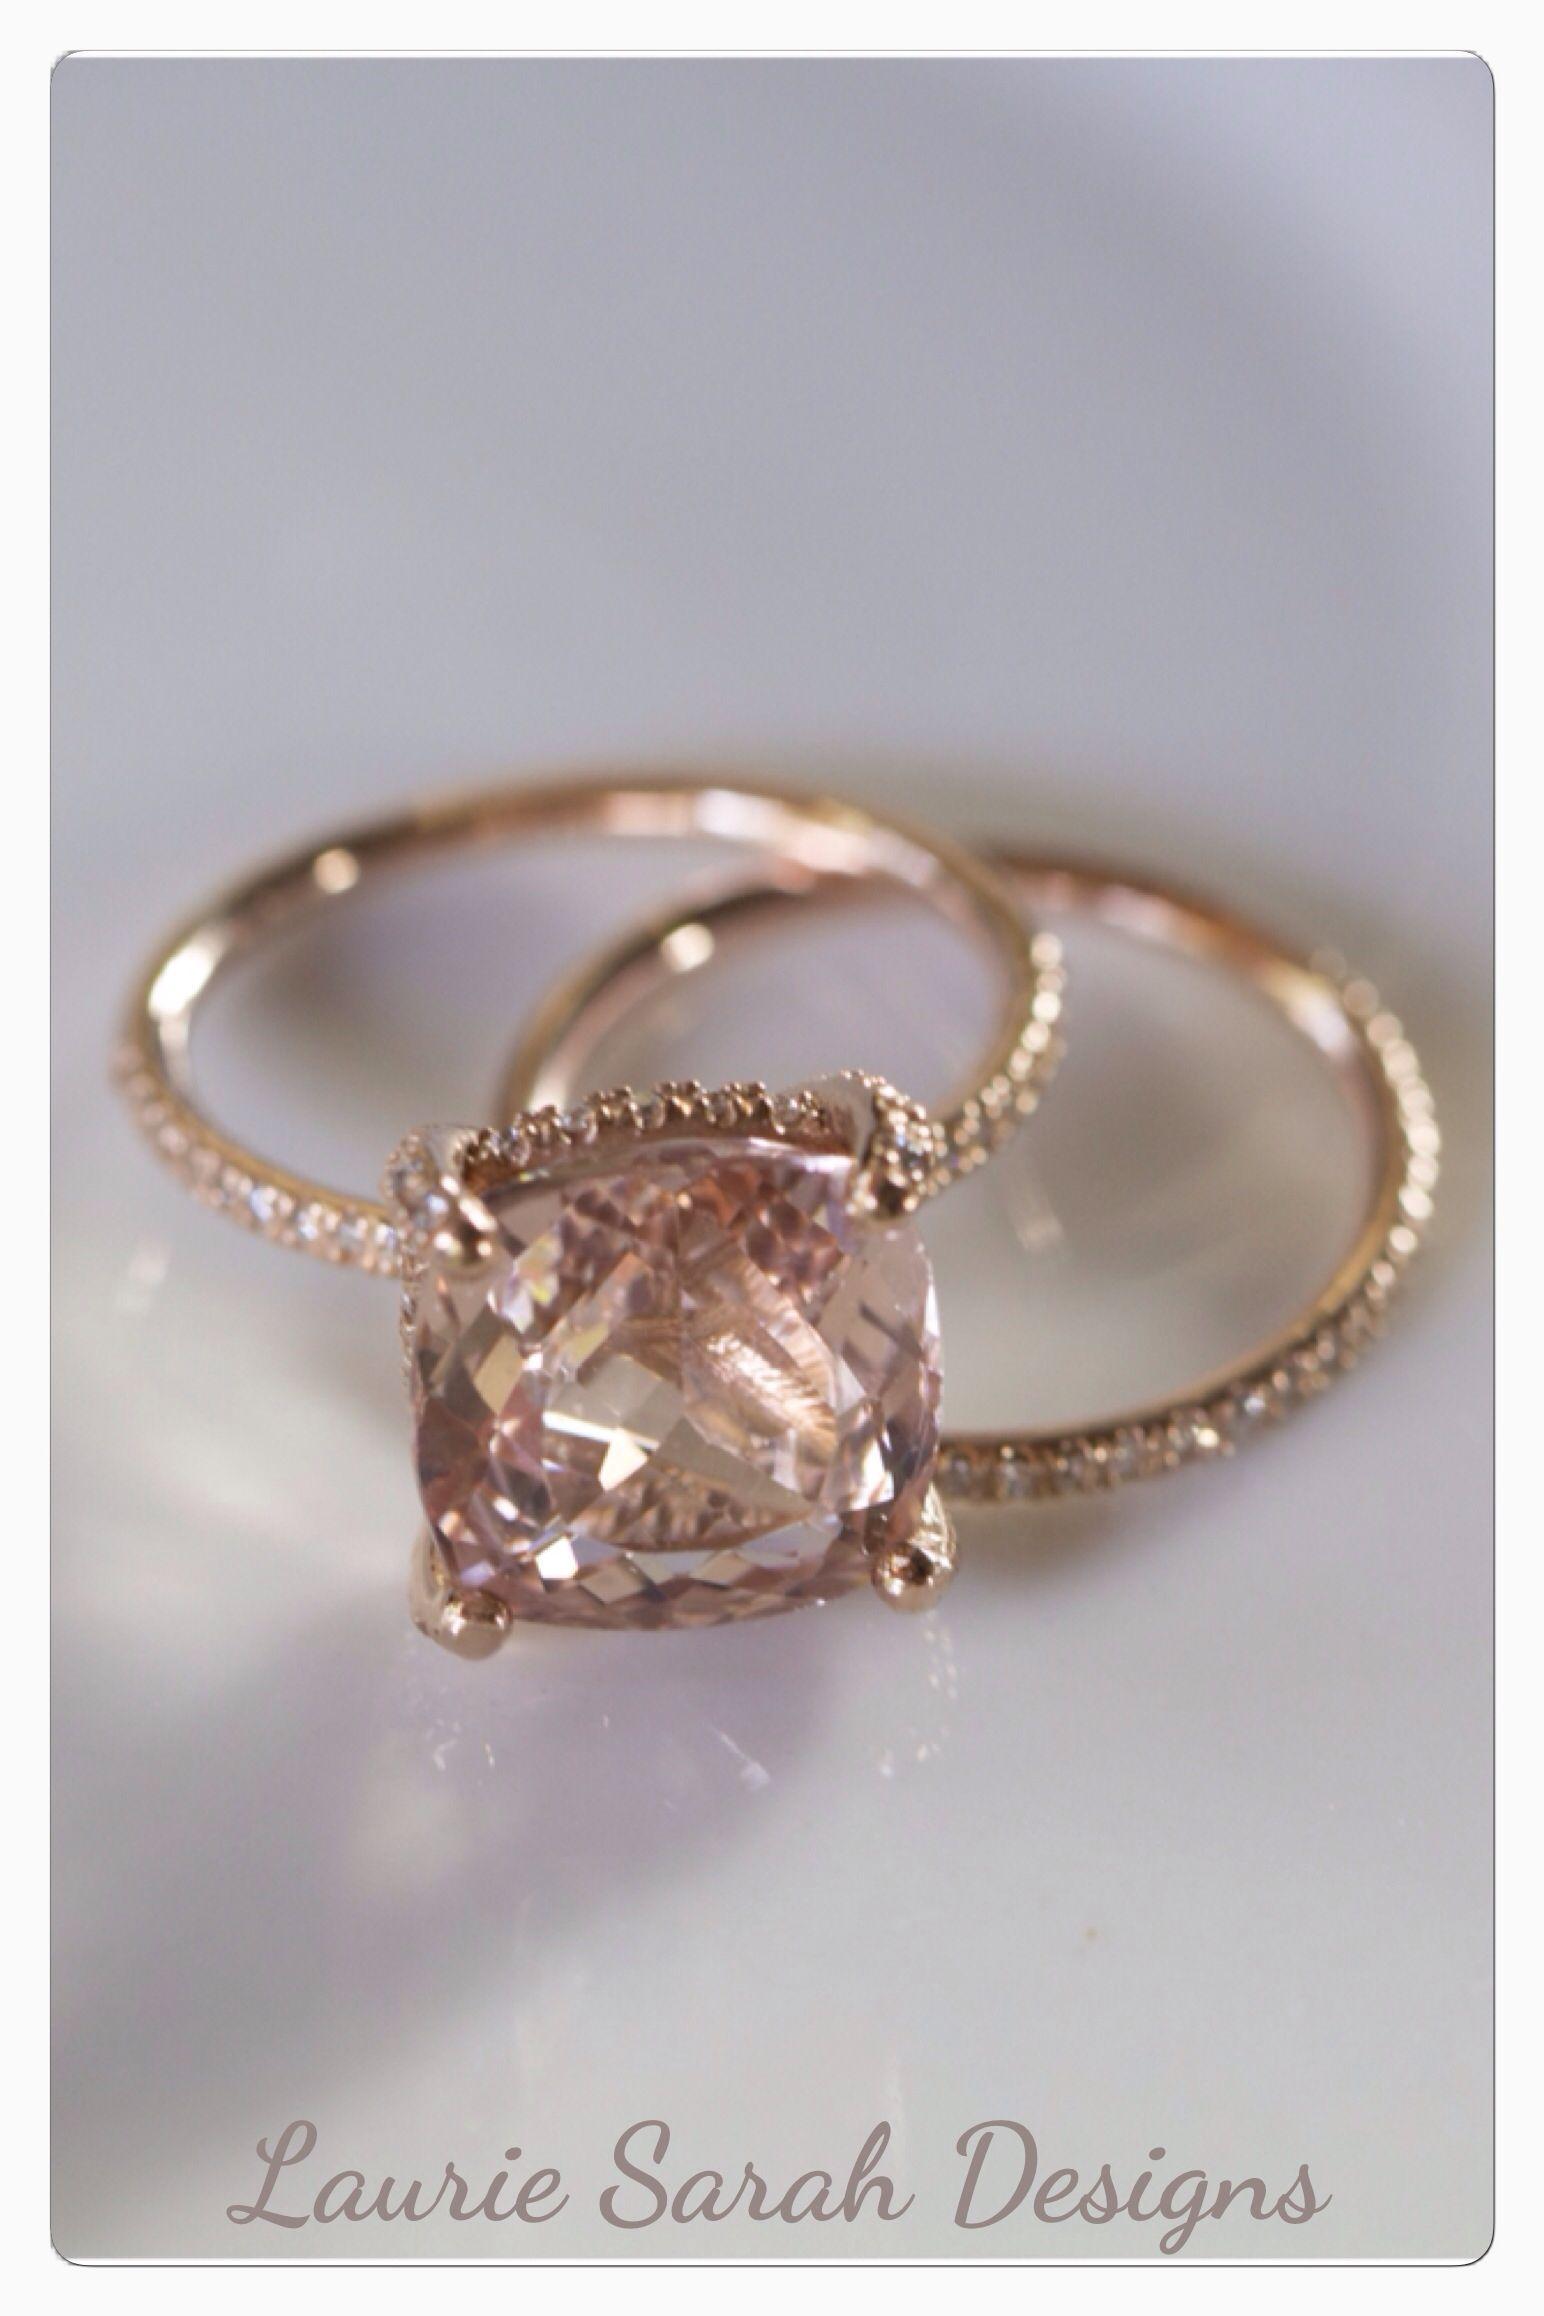 Morganite and no diamonds morganite engagement ring